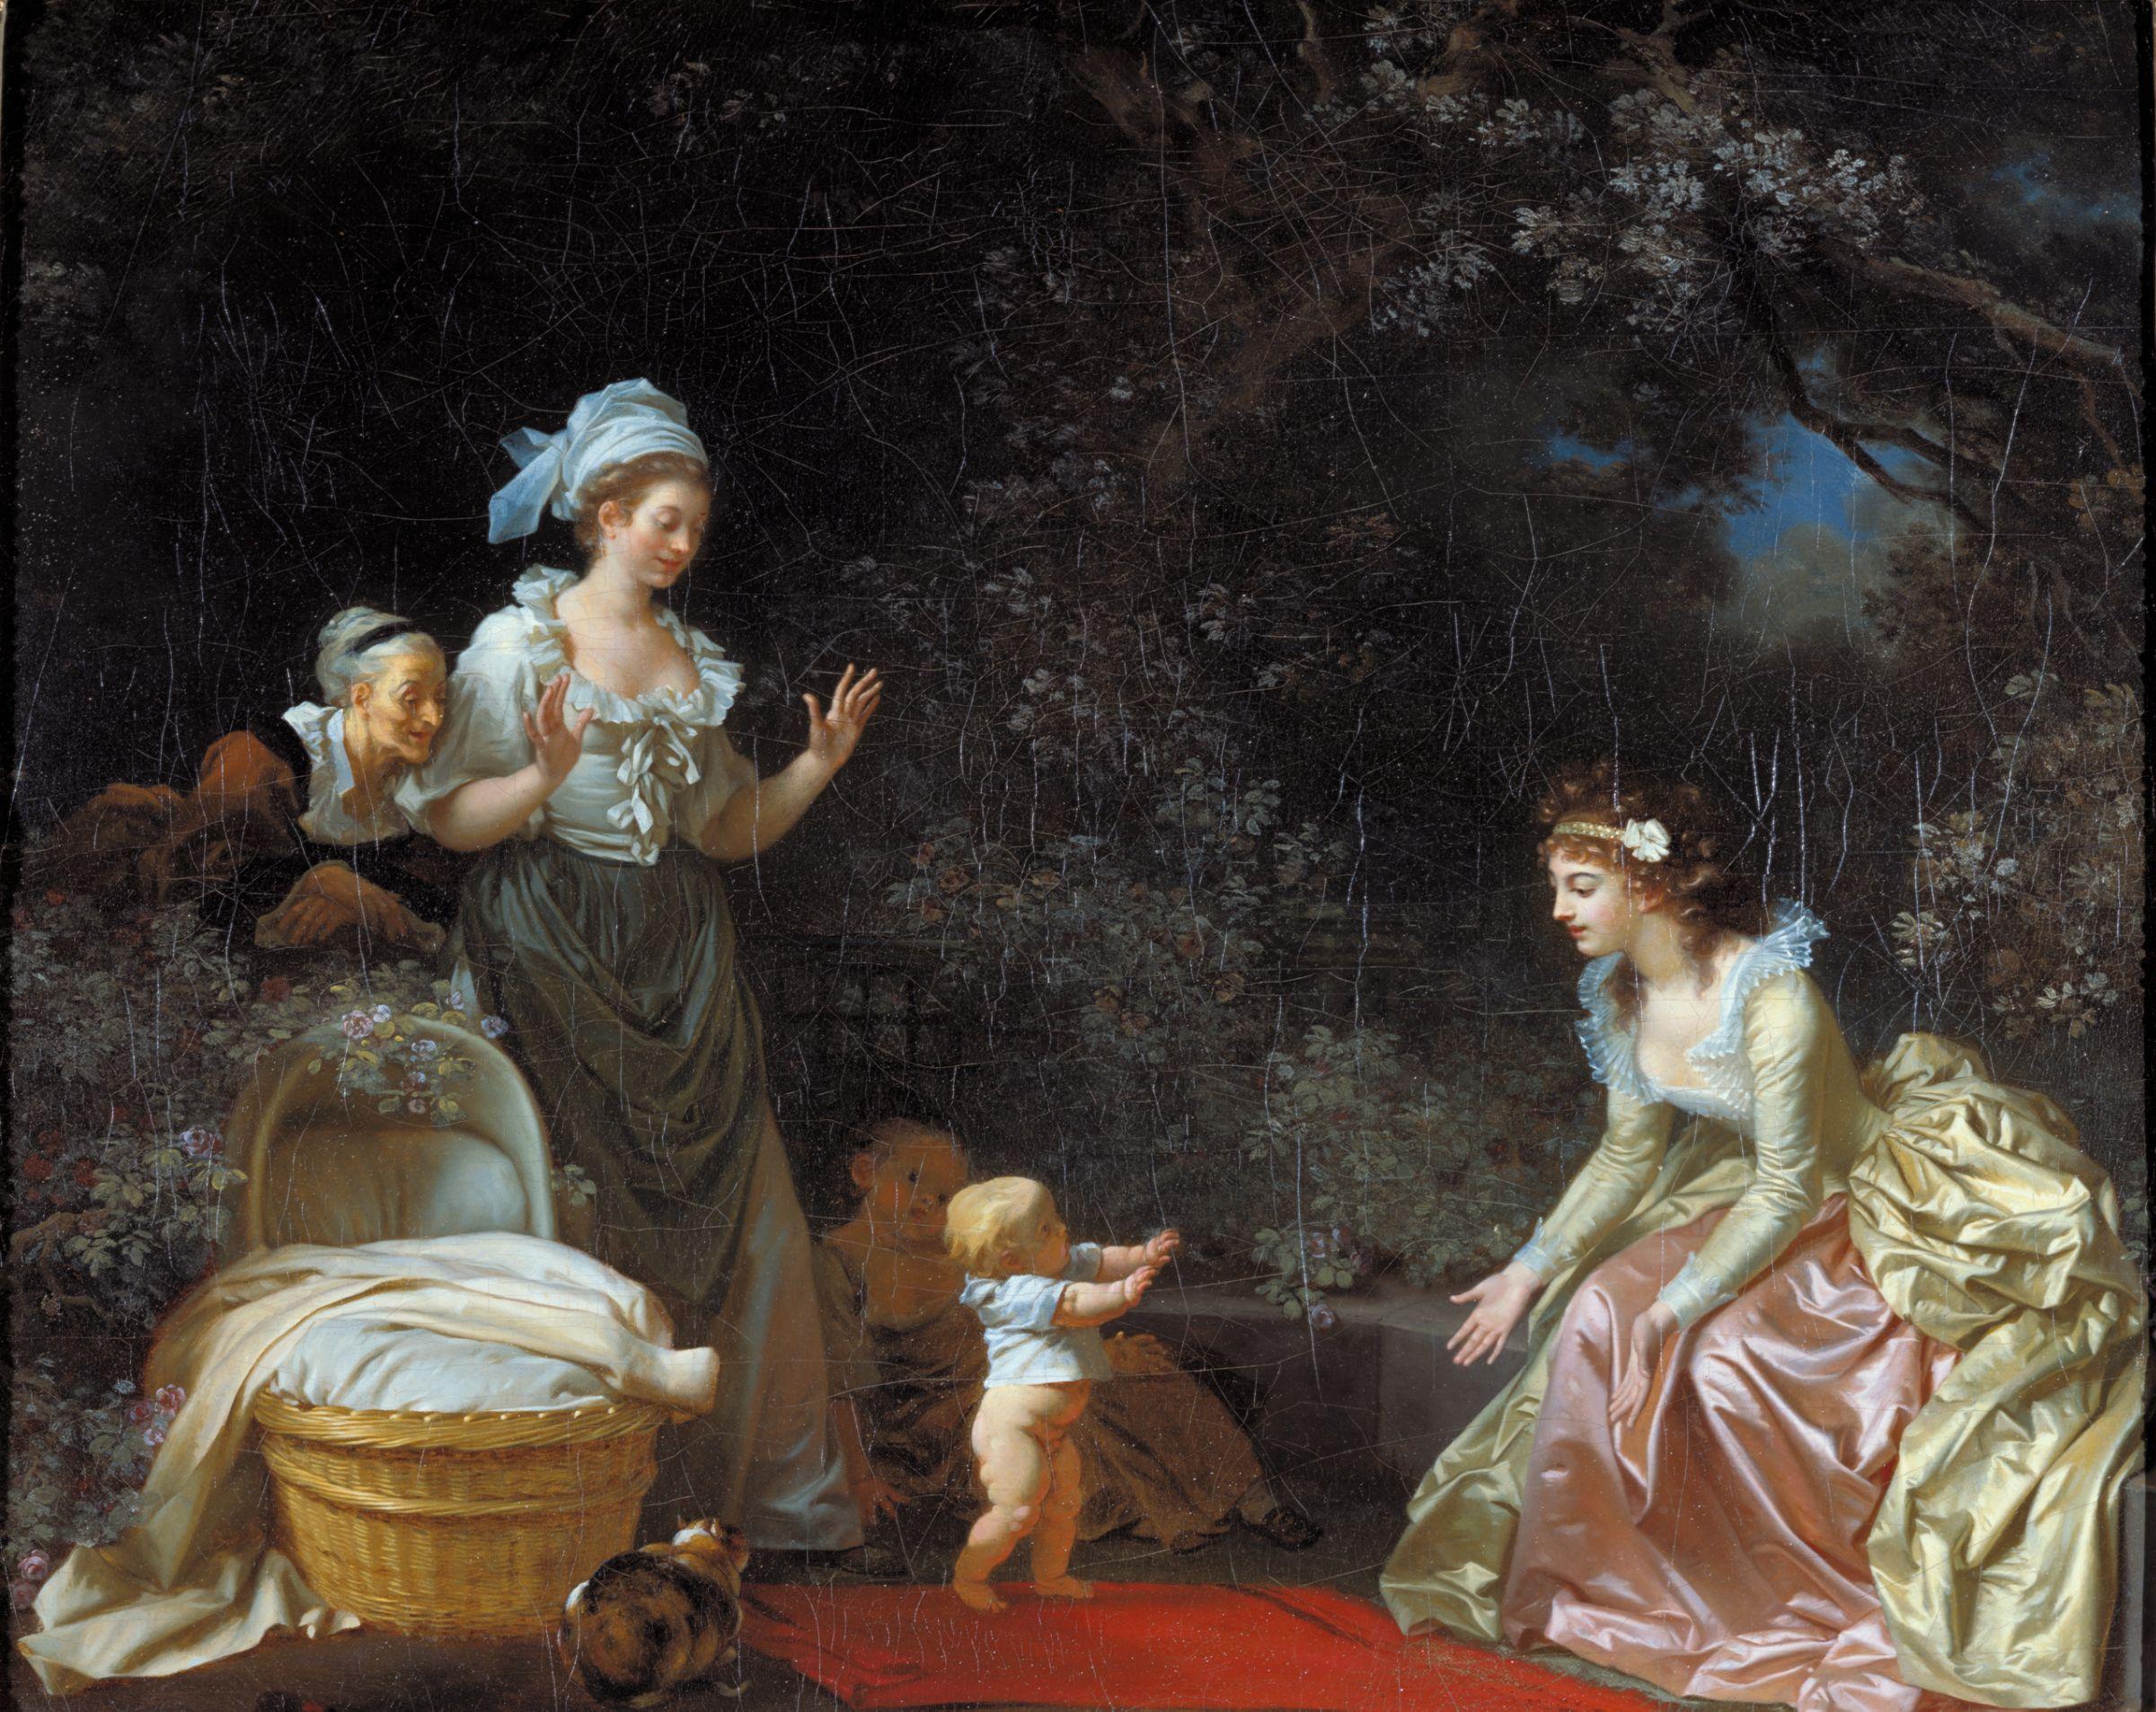 Fragonard 1780-85 Marguerite Gerard les premiers pas the first steps Harvard Art Museums, Cambridge